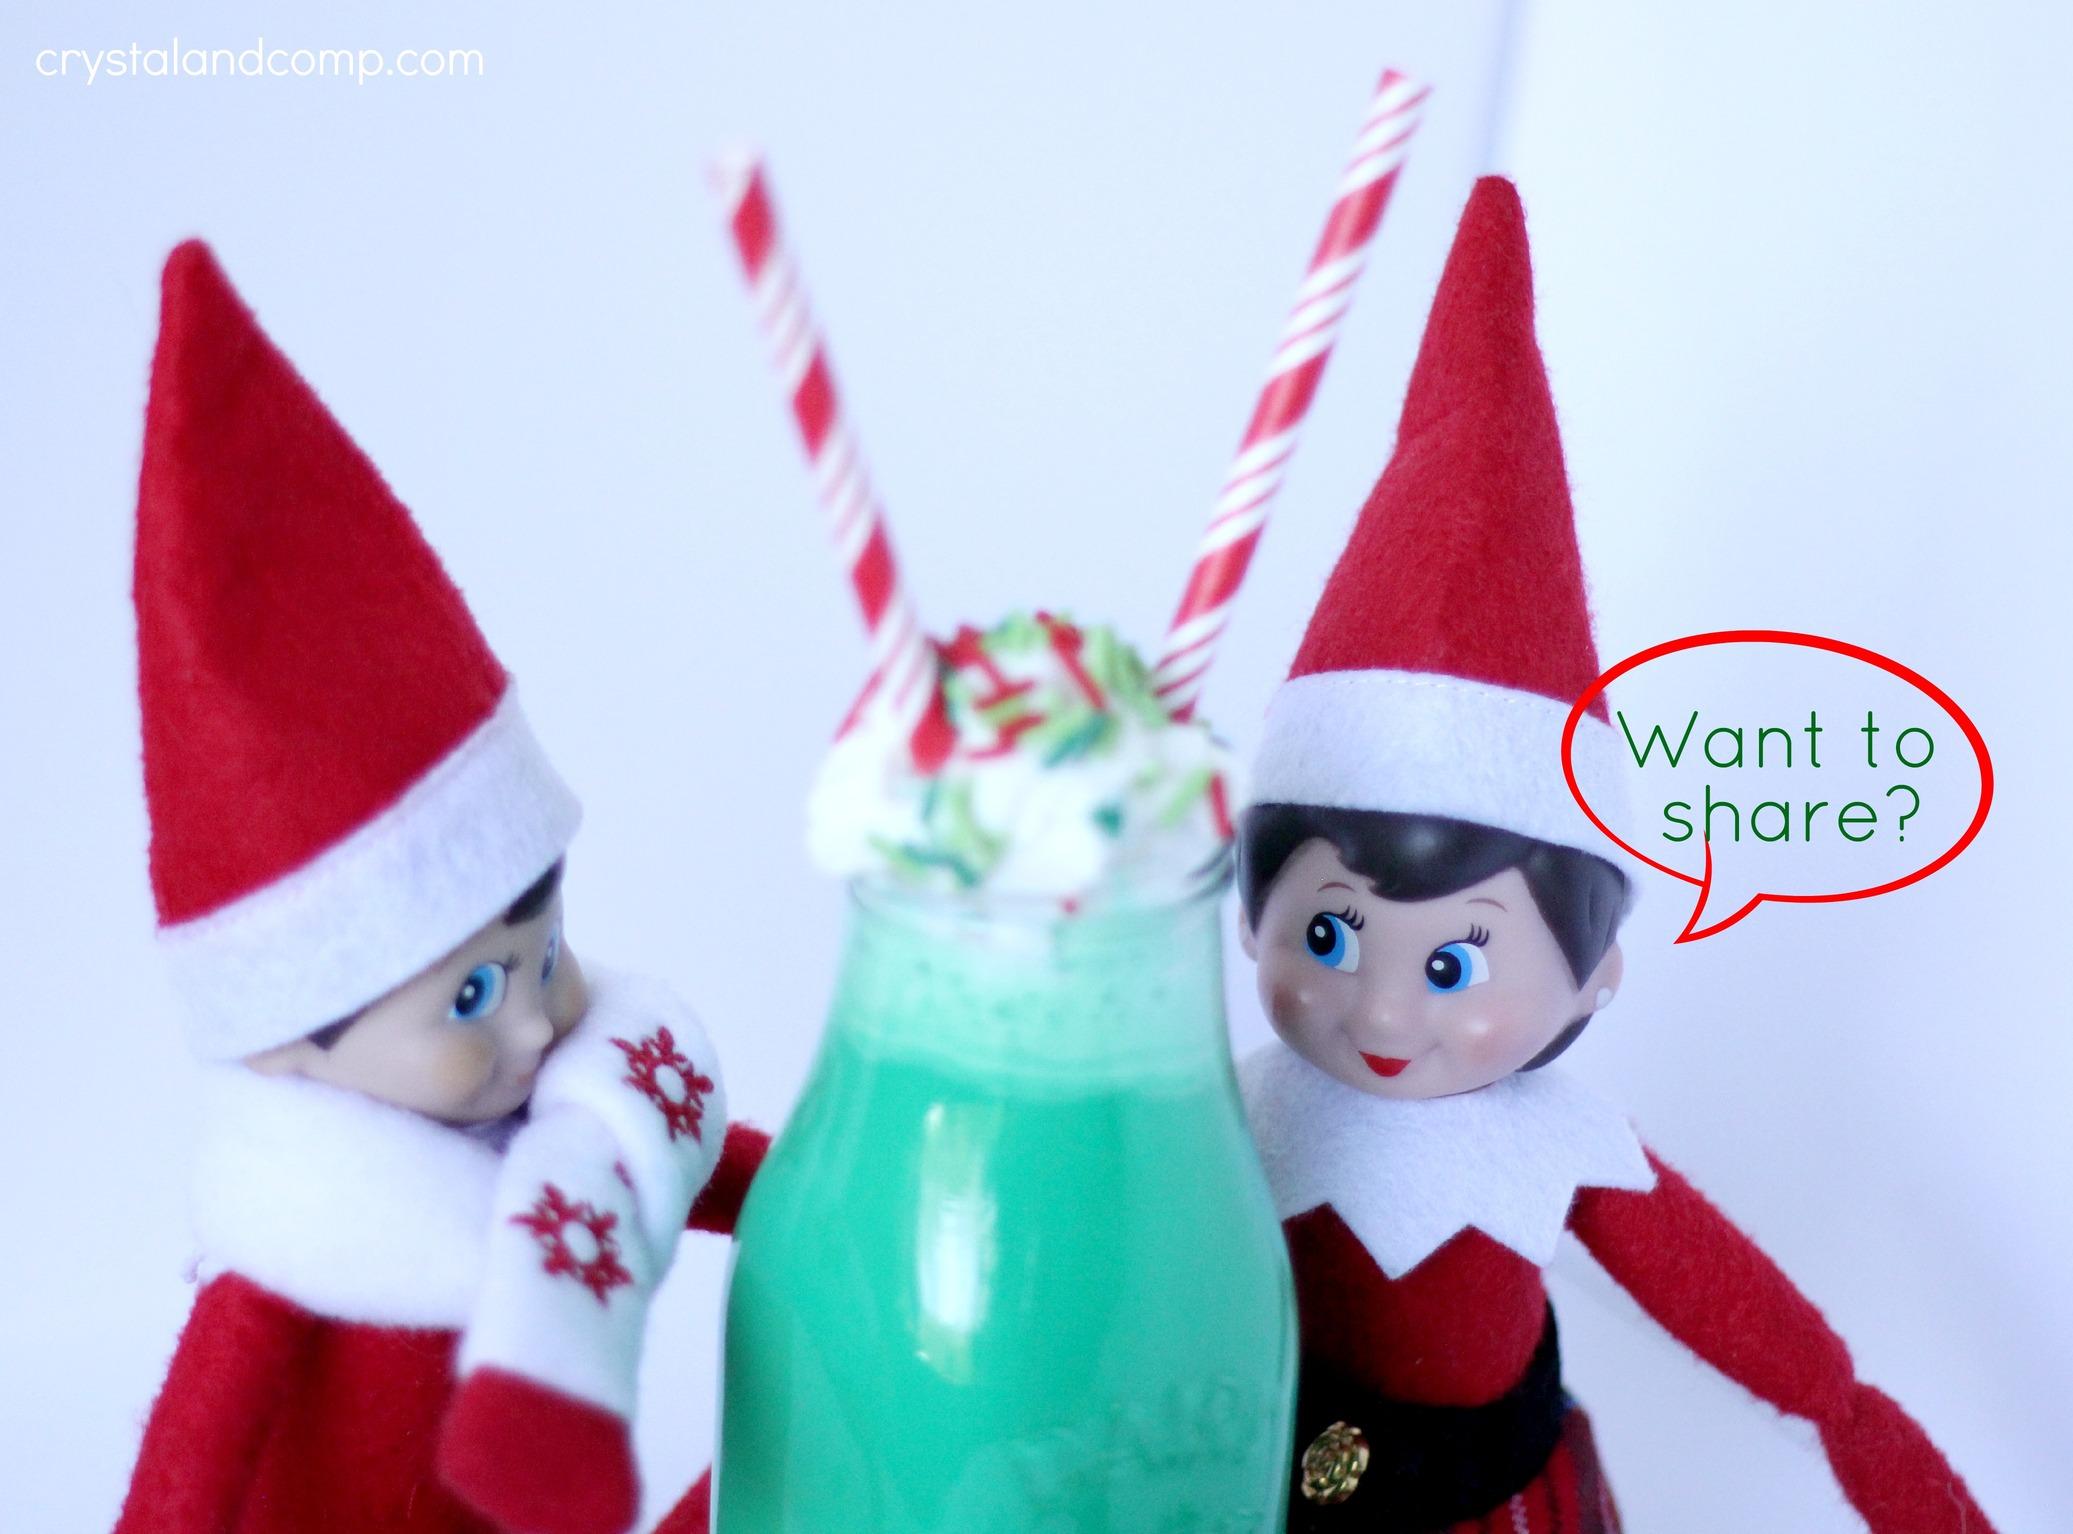 - Elf On The Shelf Ideas: Green Milk To Share